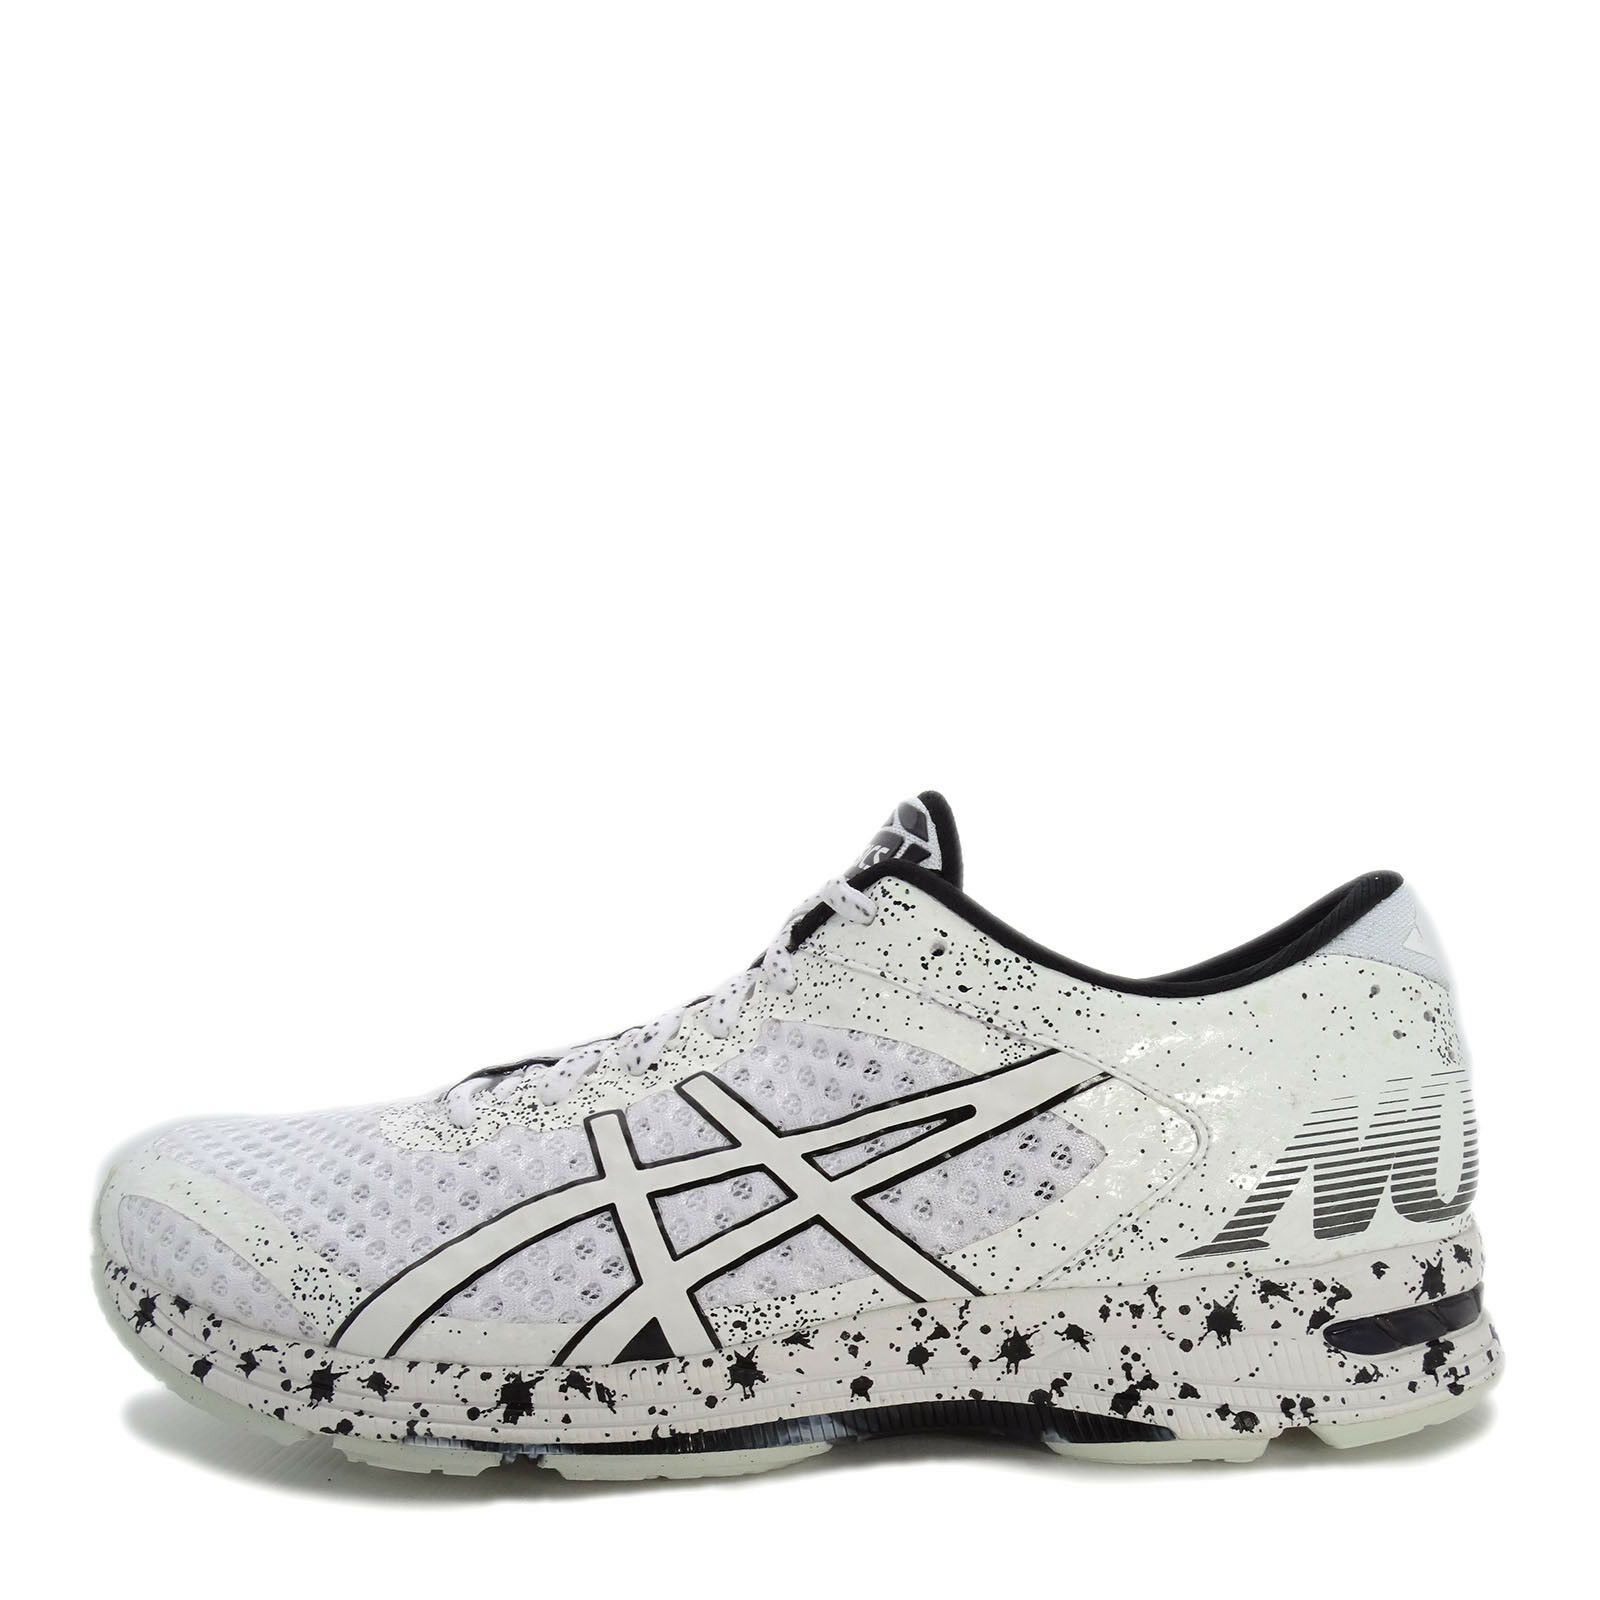 Asics GEL-Noosa TRI 11 [T626Q-0101] Men Running shoes White Black